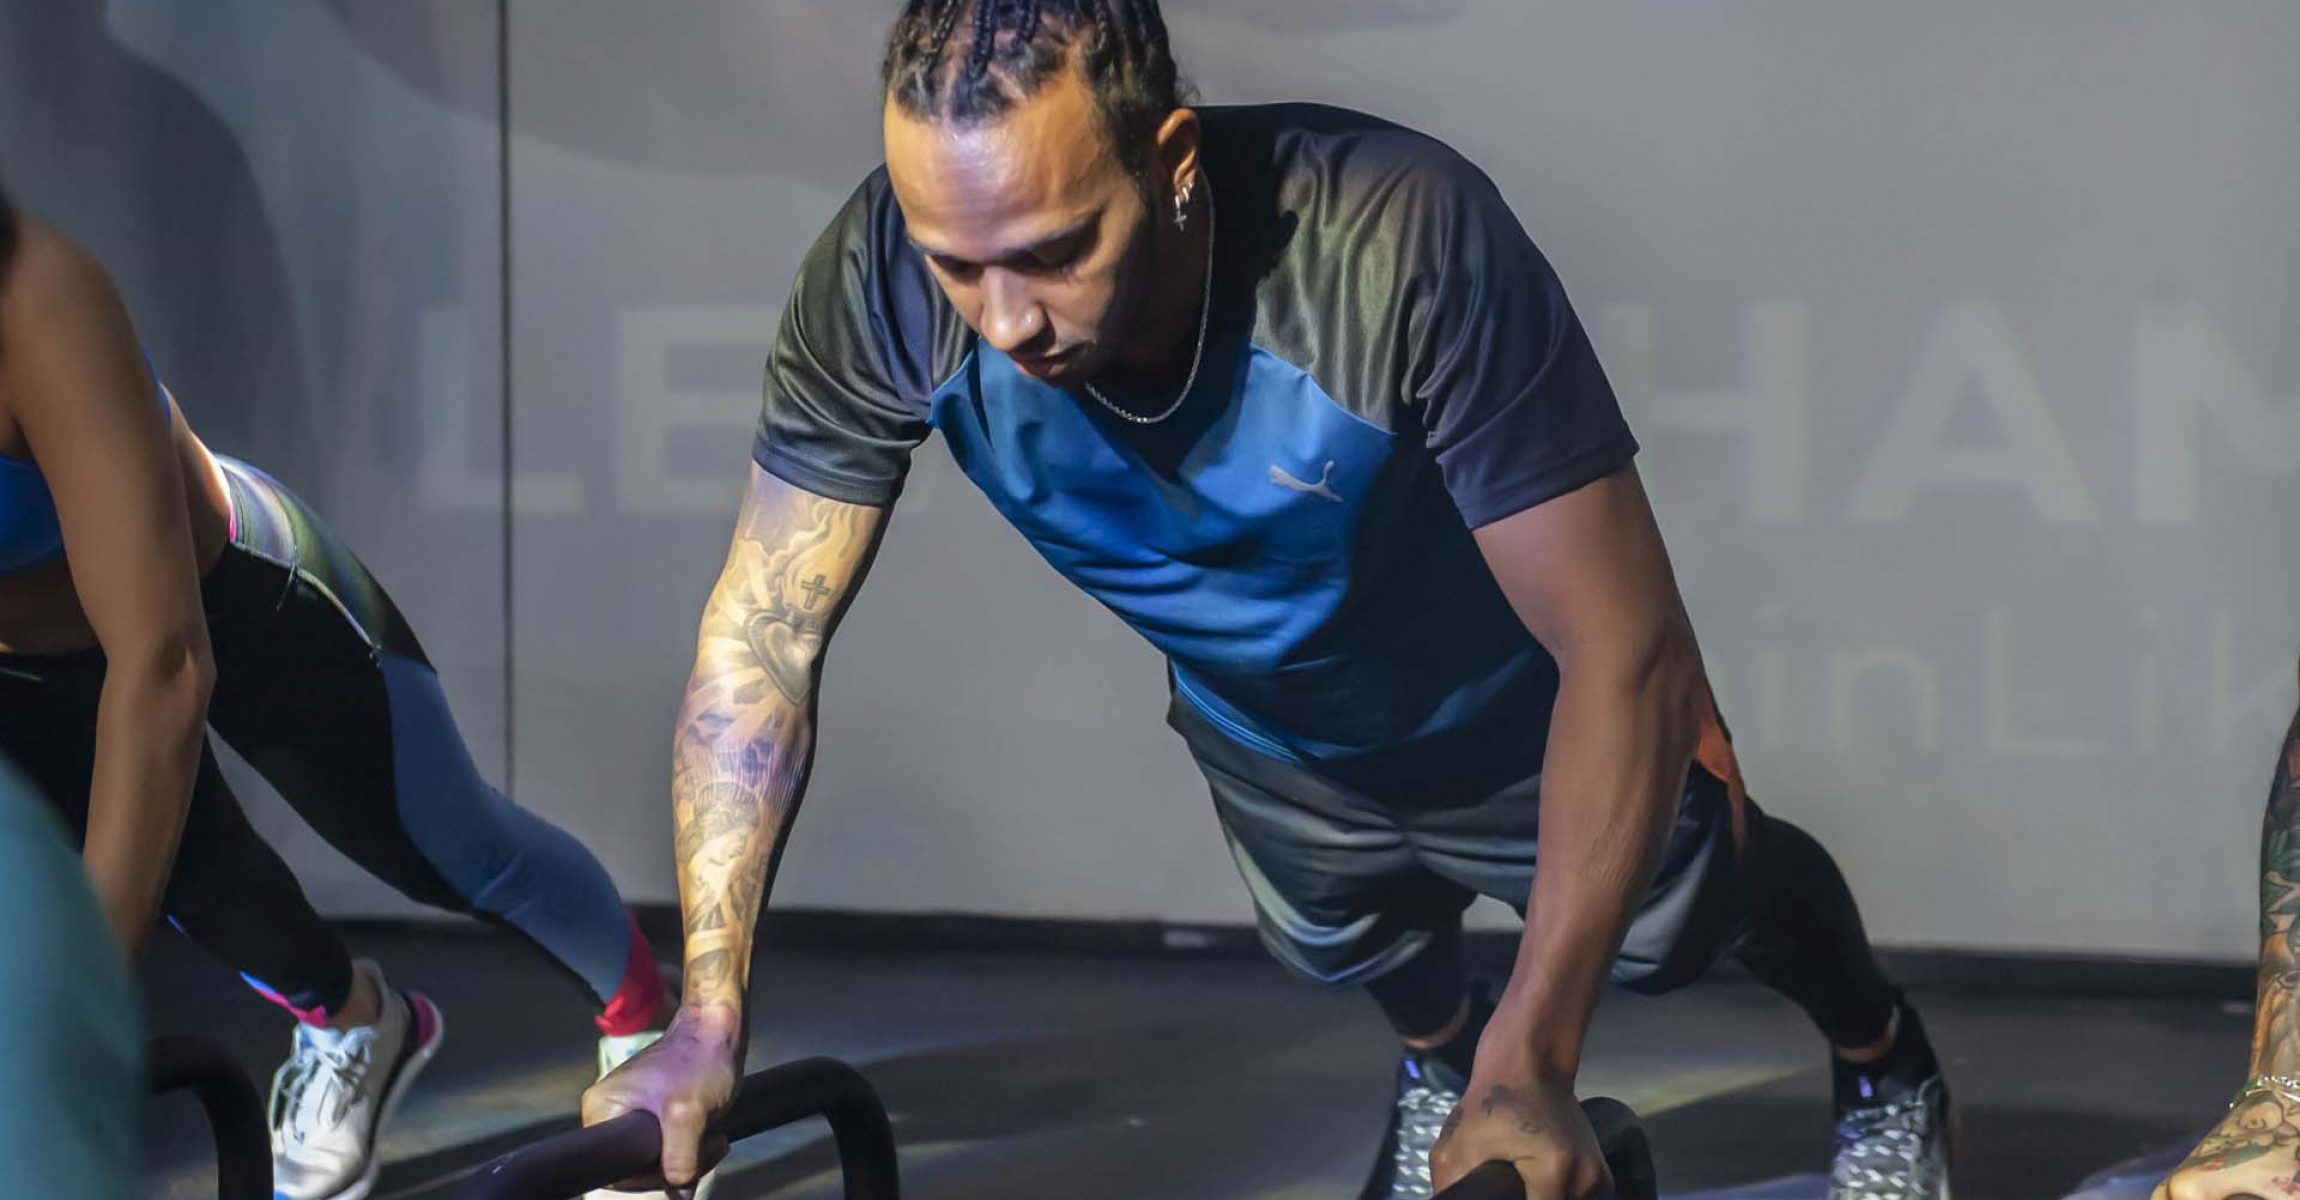 Lewis Hamilton training, PUMA